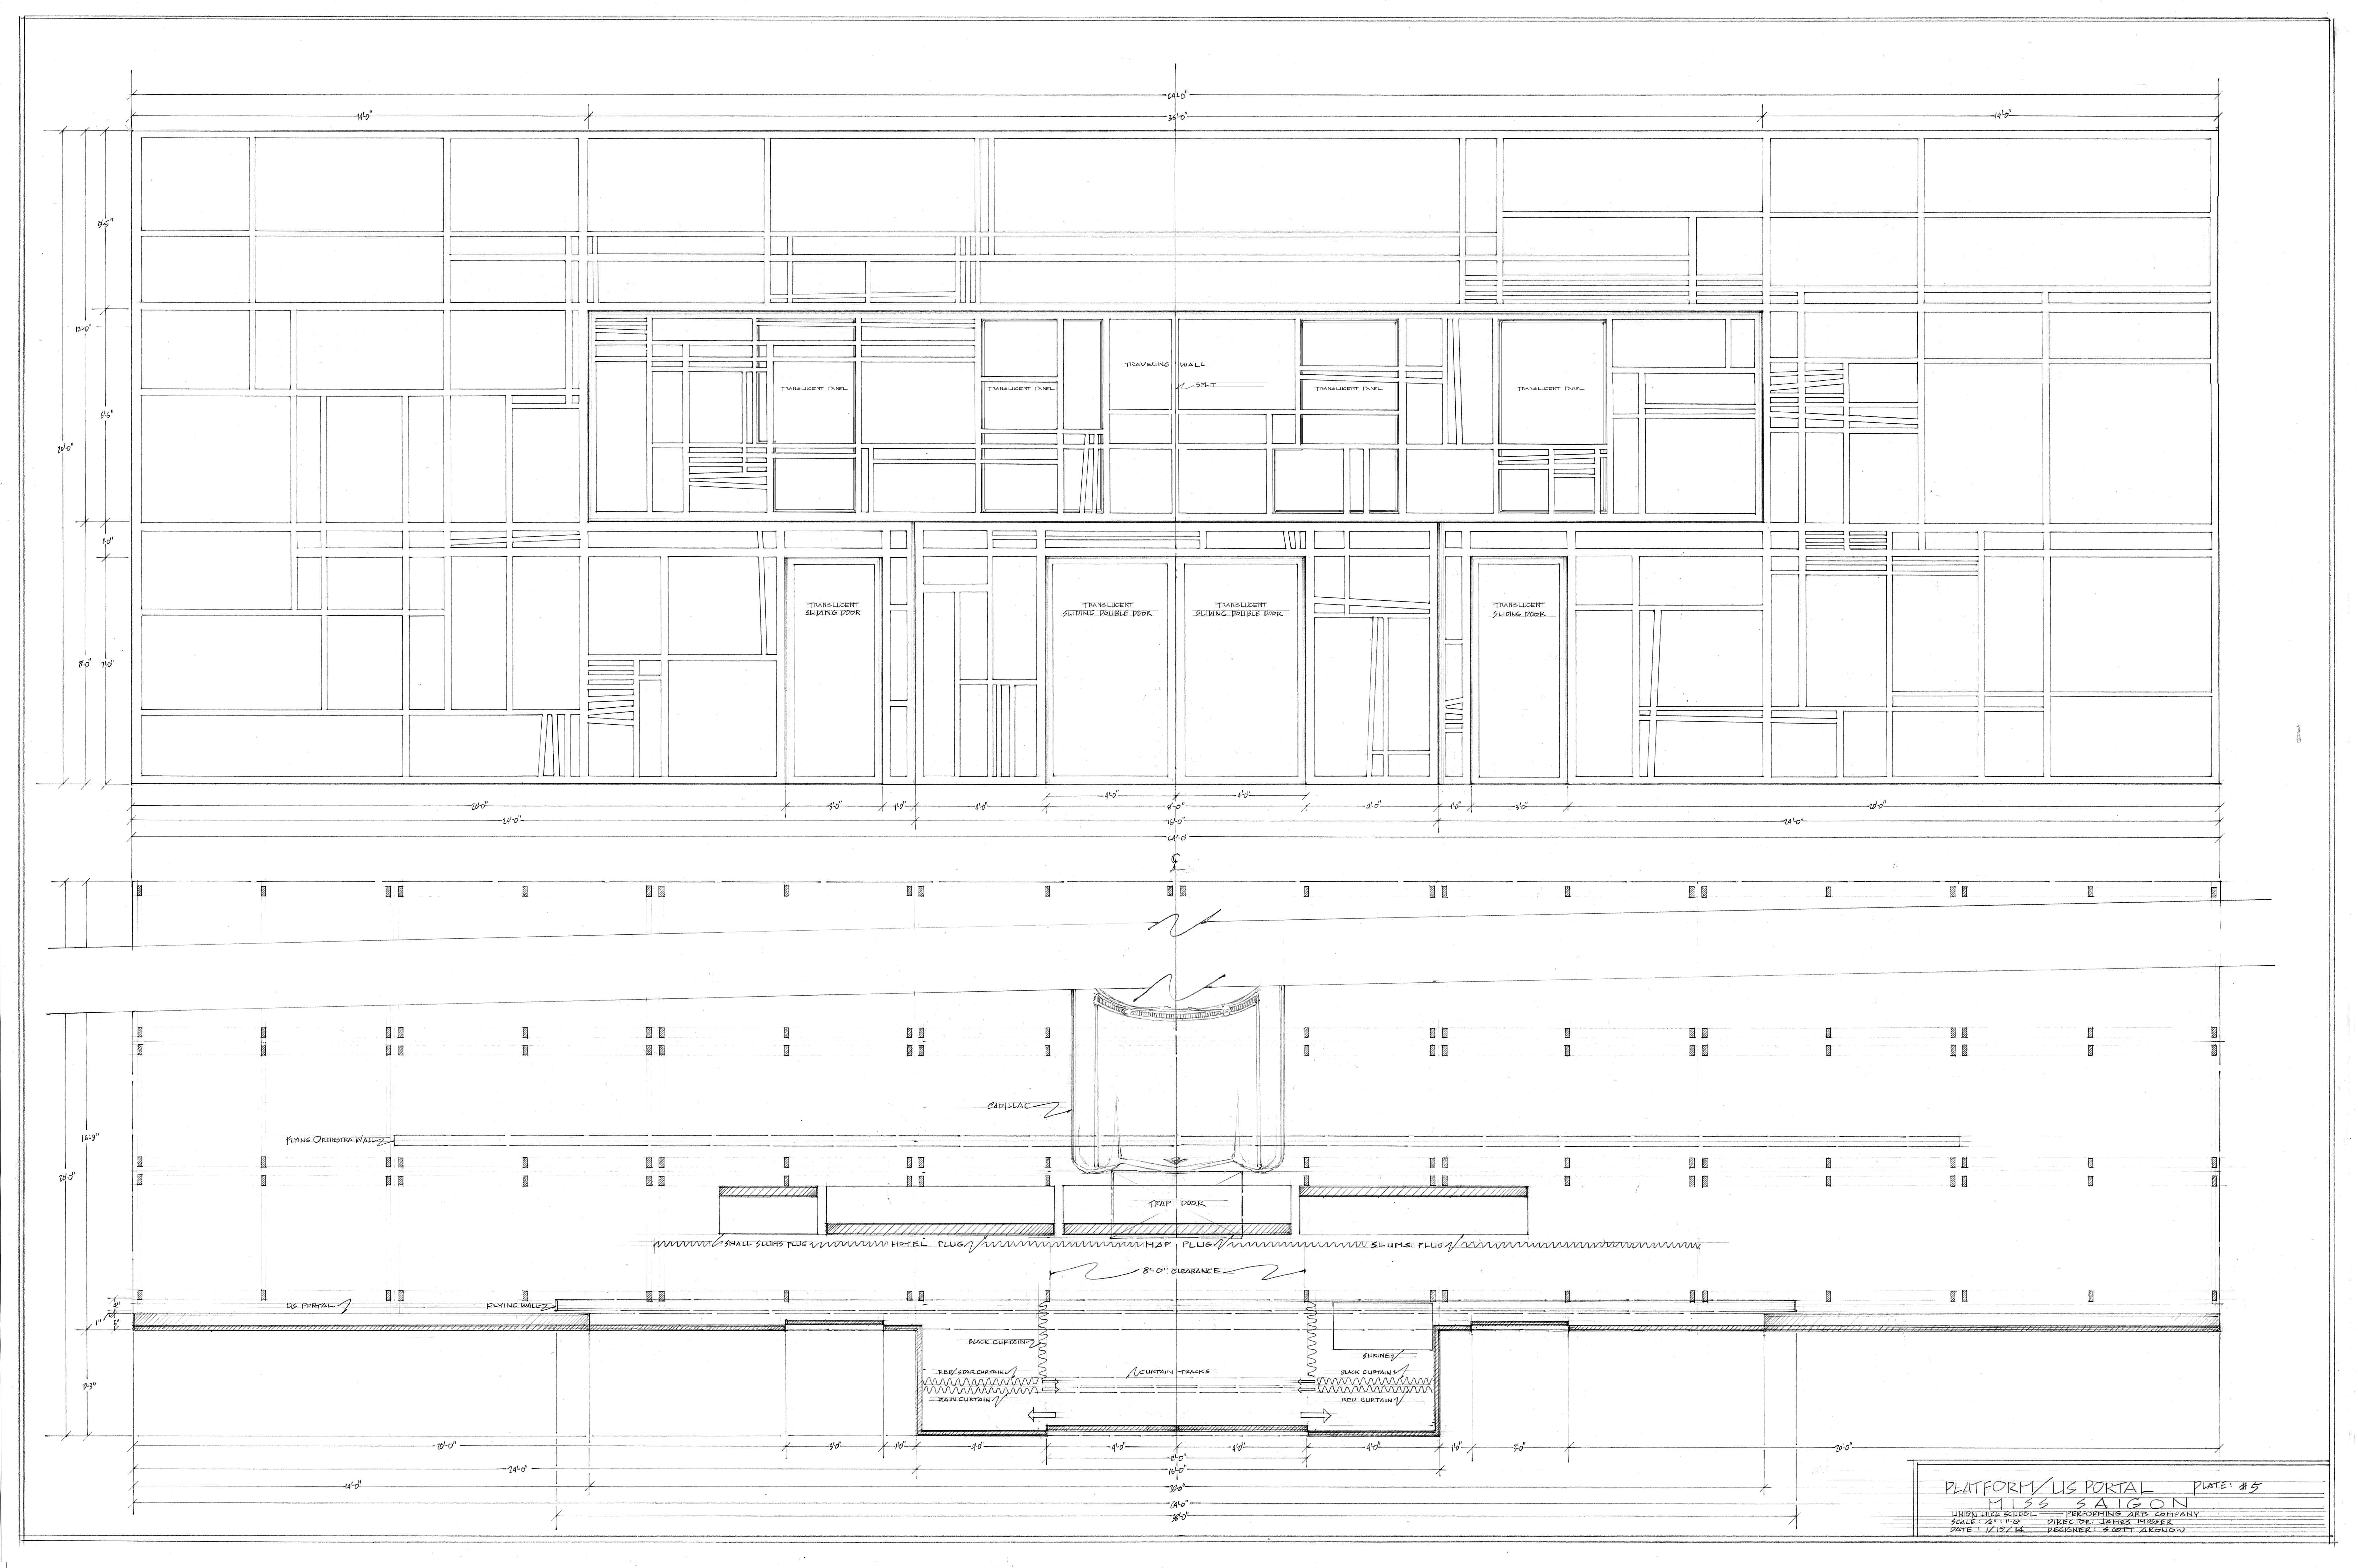 Plate #5. Upstage Portal and Platform Elevation